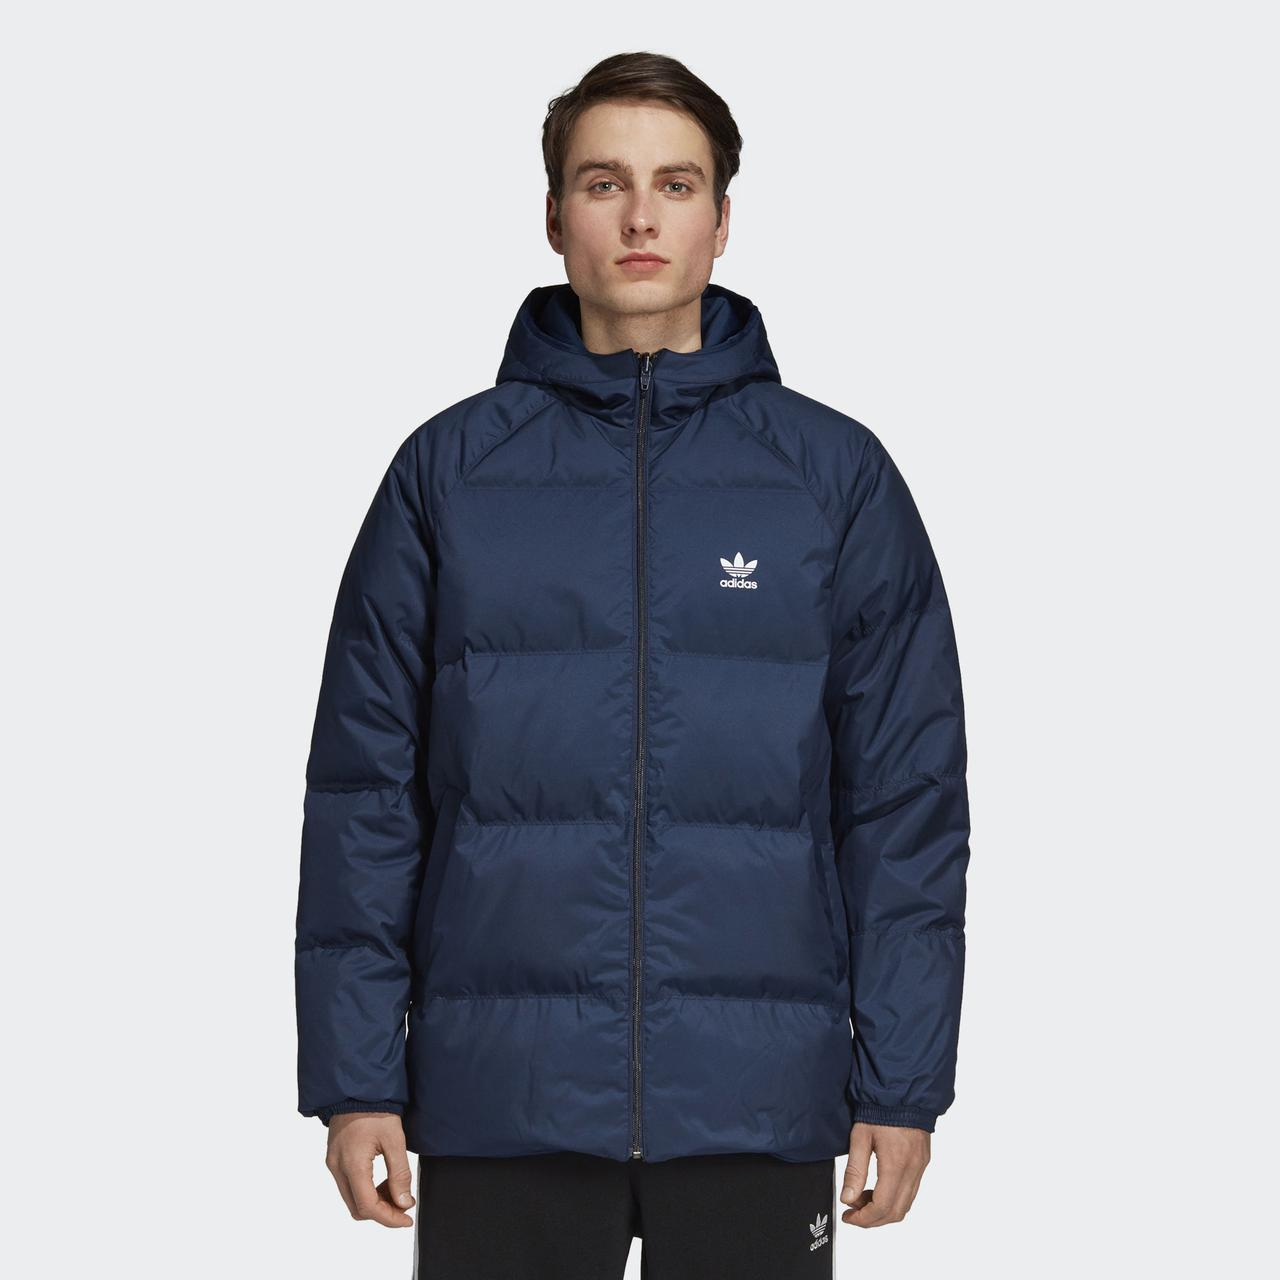 Мужская куртка Adidas Originals SST (Артикул: DH5004)